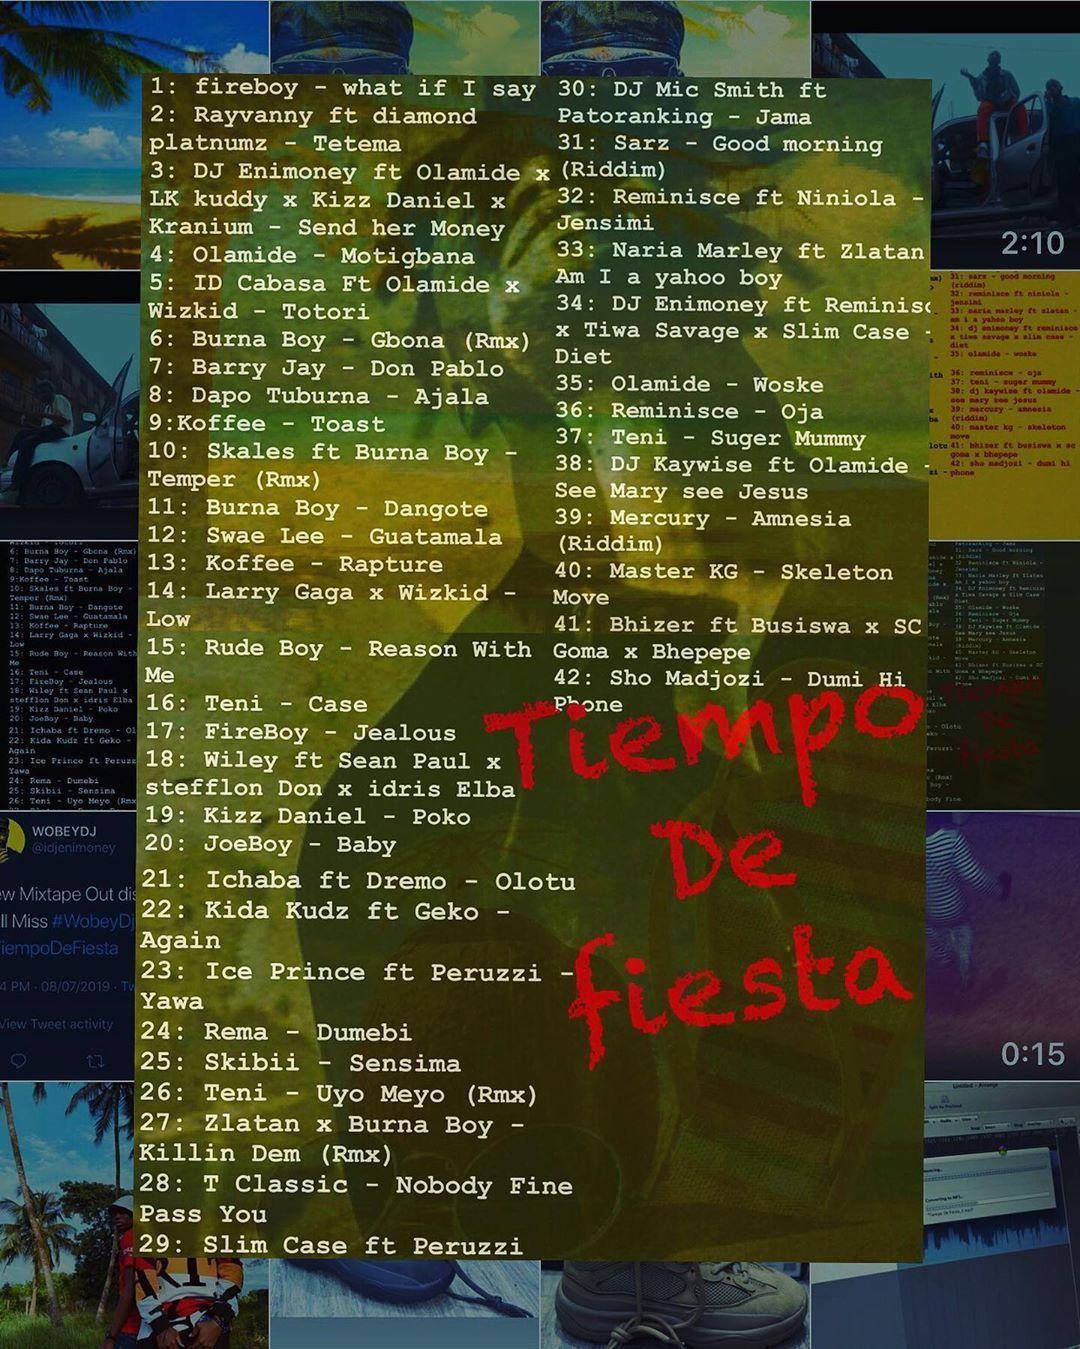 MIXTAPE] DJ Enimoney - Tiempo De Fiesta Mixtape MP3 » Naijashaku